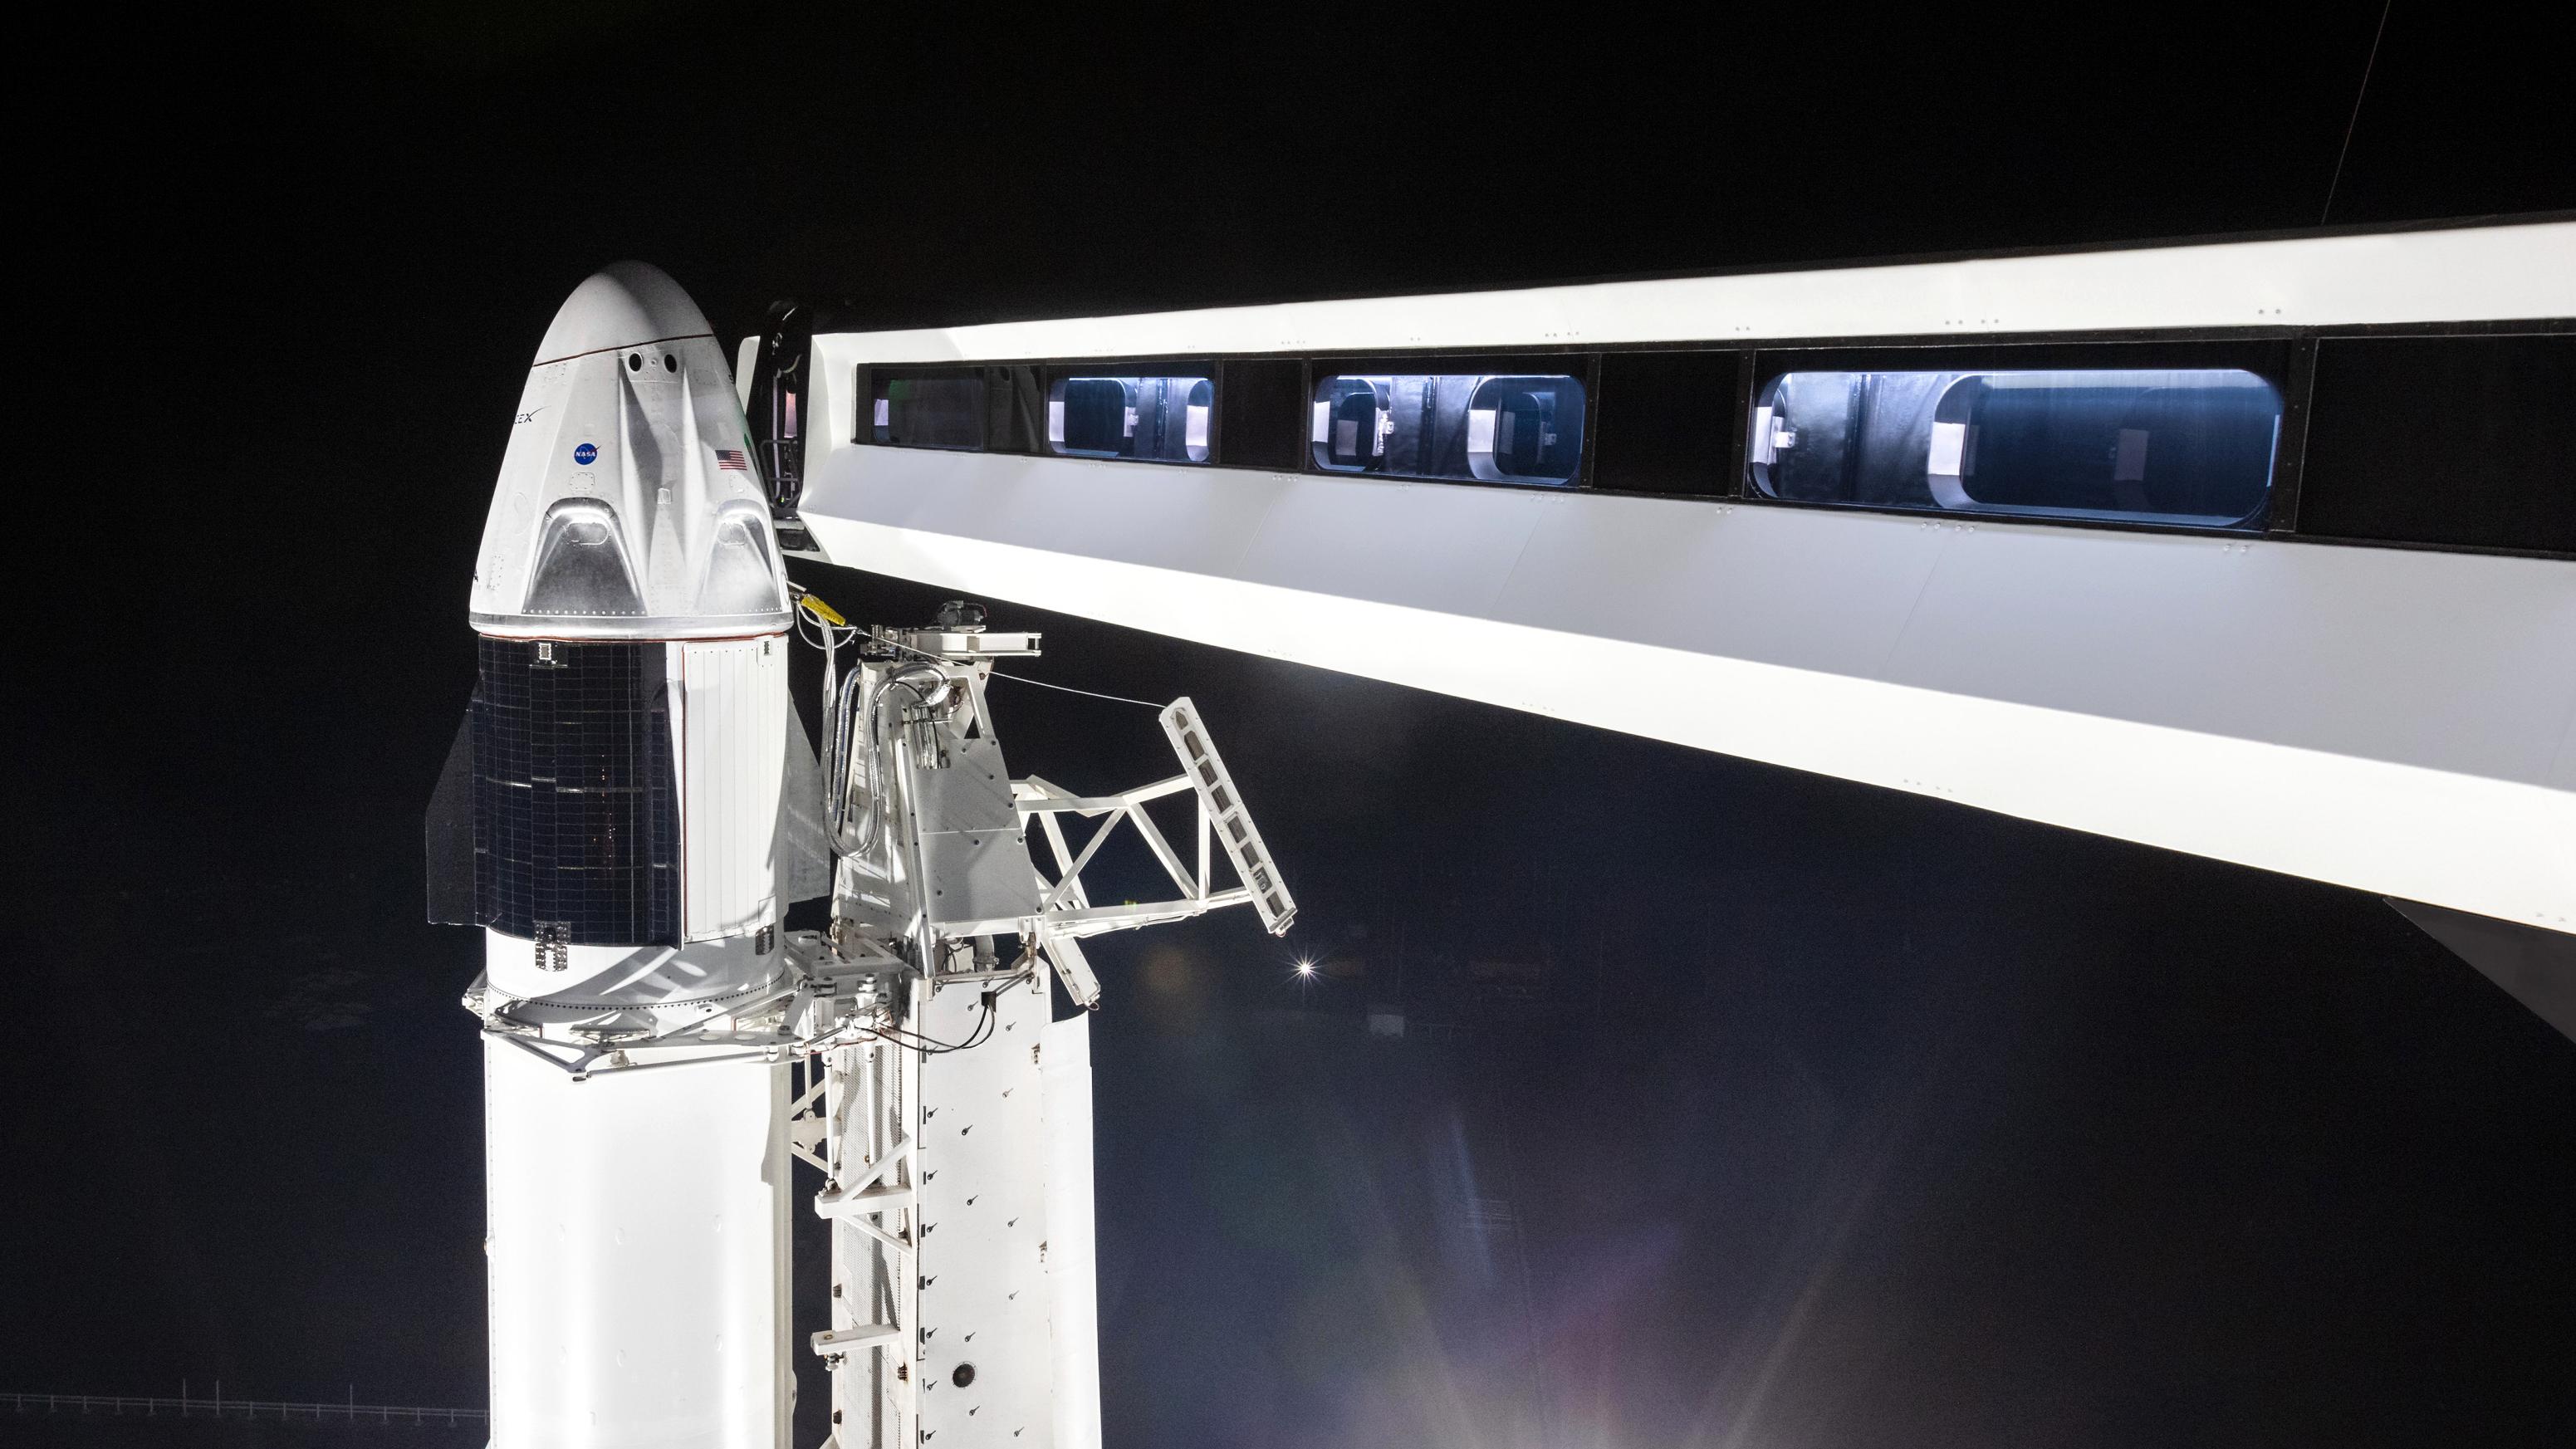 SpaceX's test failure shows how spacecraft get made — Quartz